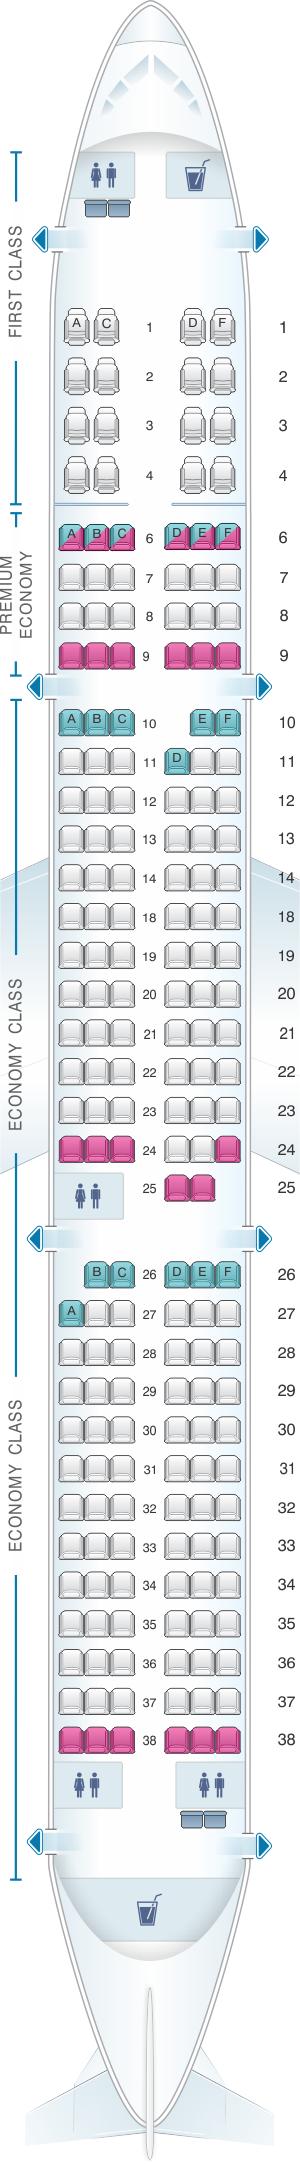 Seat map for Alaska Airlines - Horizon Air Airbus A321 NEO retrofit